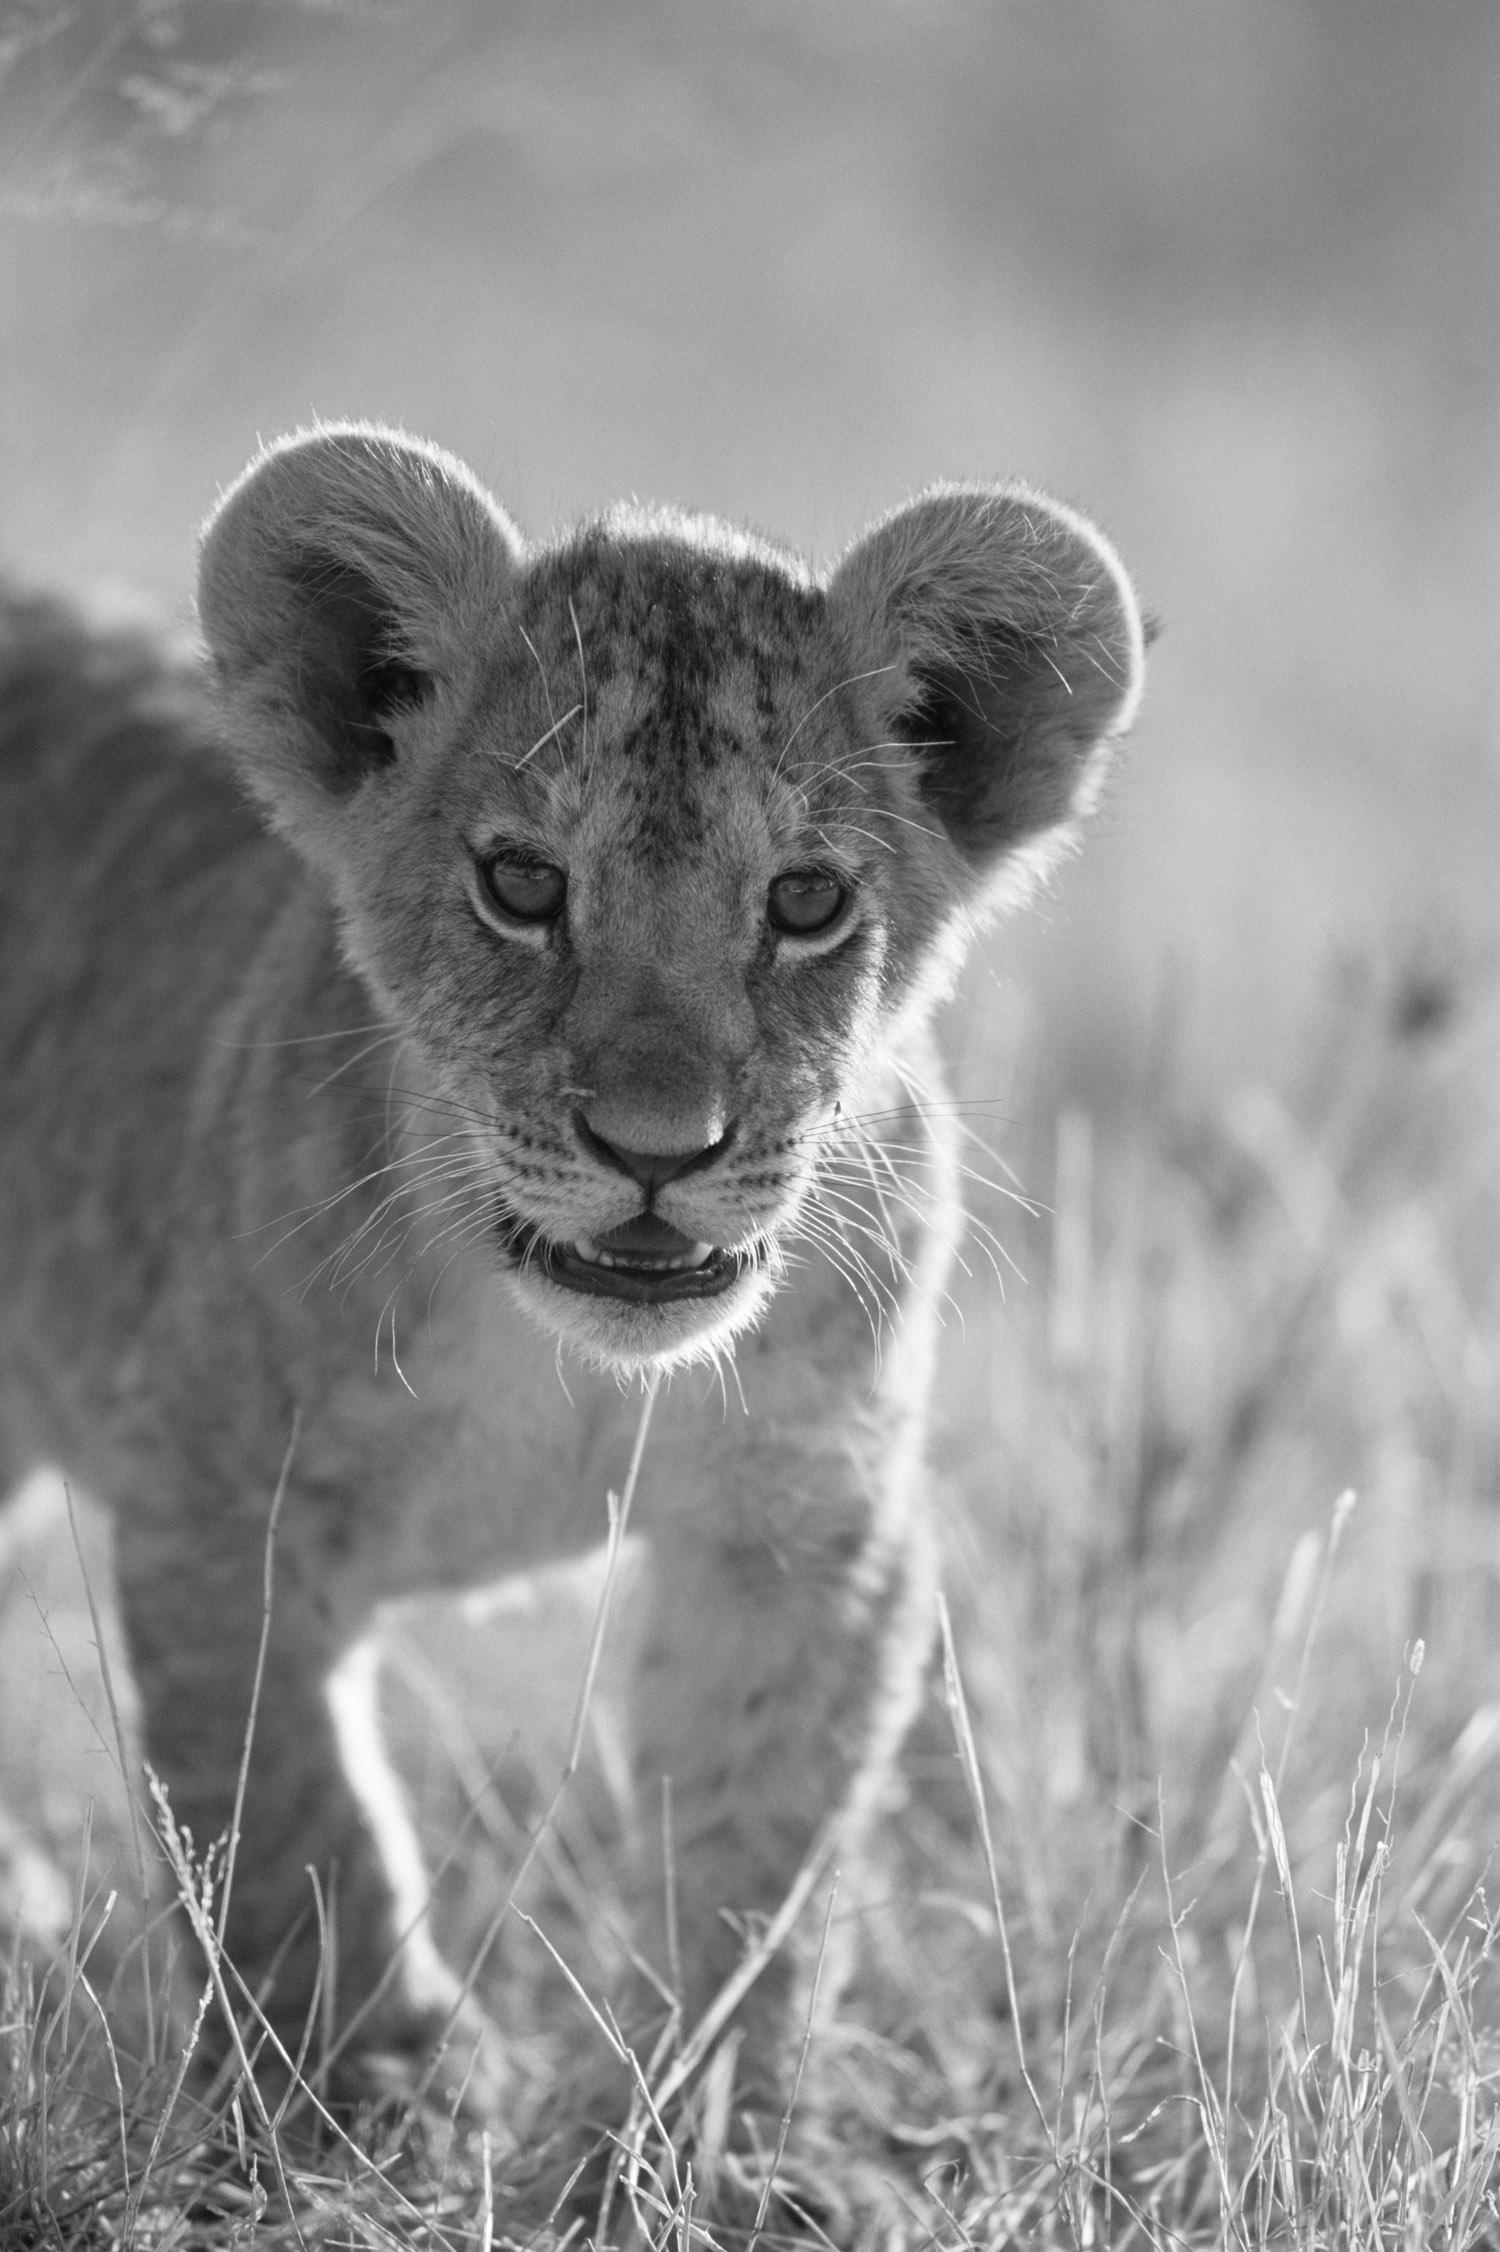 Lion cub portrait, Samburu National Reserve, Kenya